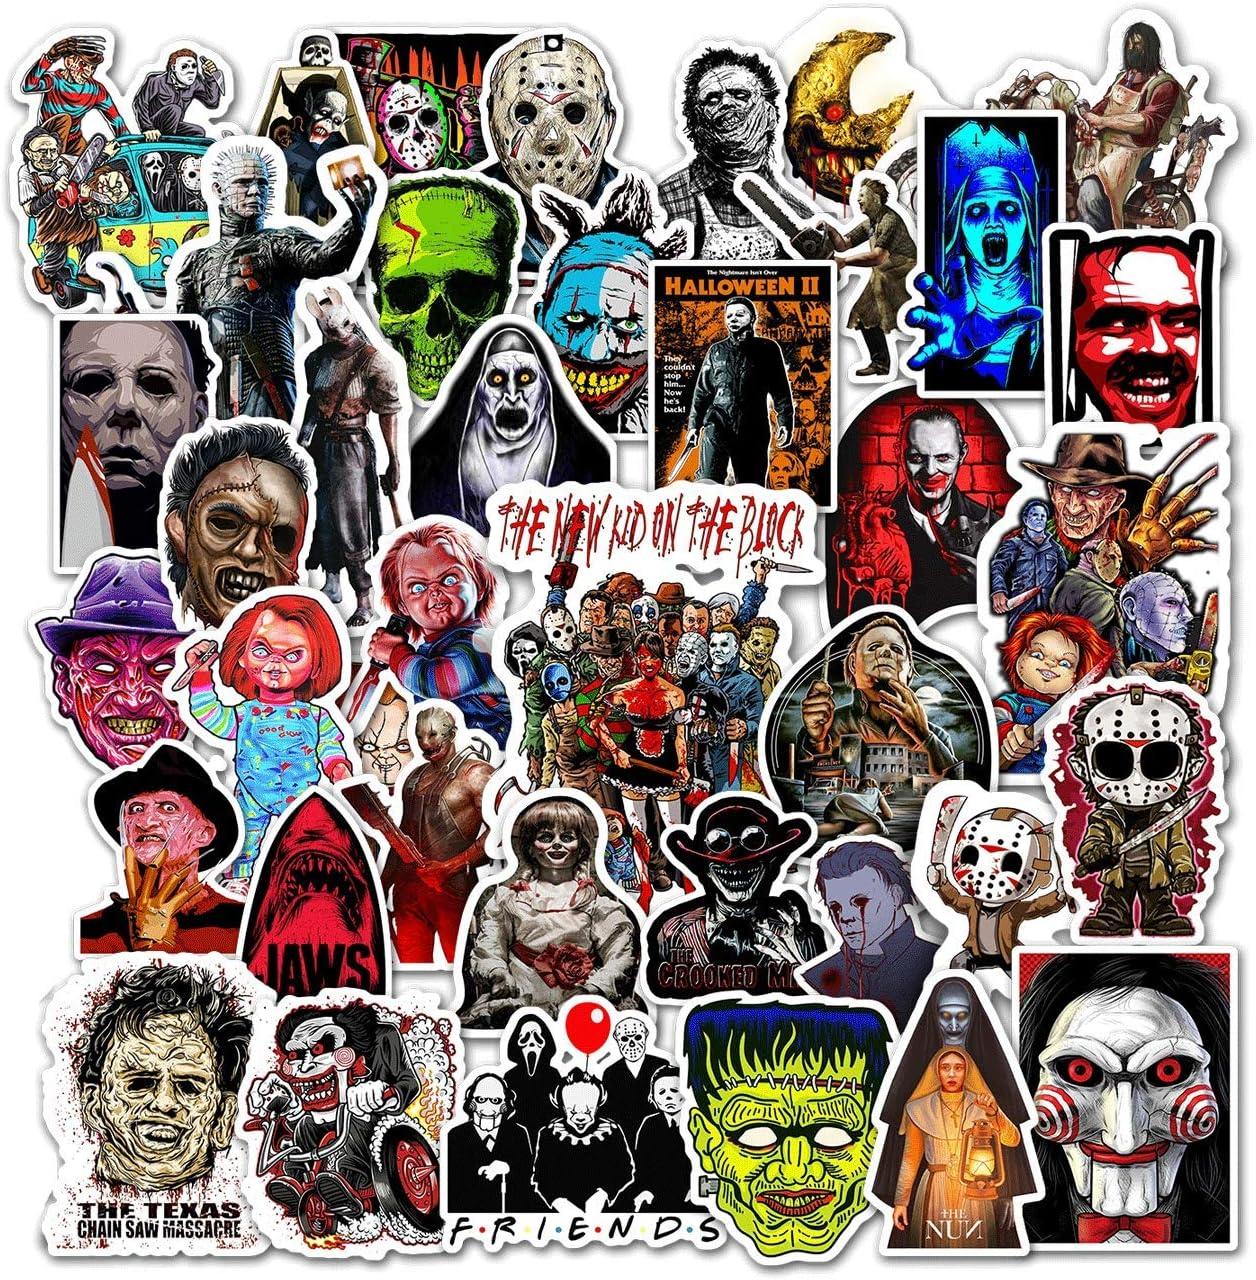 Kilmila Horror Sticker(50 pcs). Halloween Themed Terror Horror Movie Sticker Horror Gifts Toys for Kids Teens Car Window Laptop Phone Luggage Skateboard Graffiti